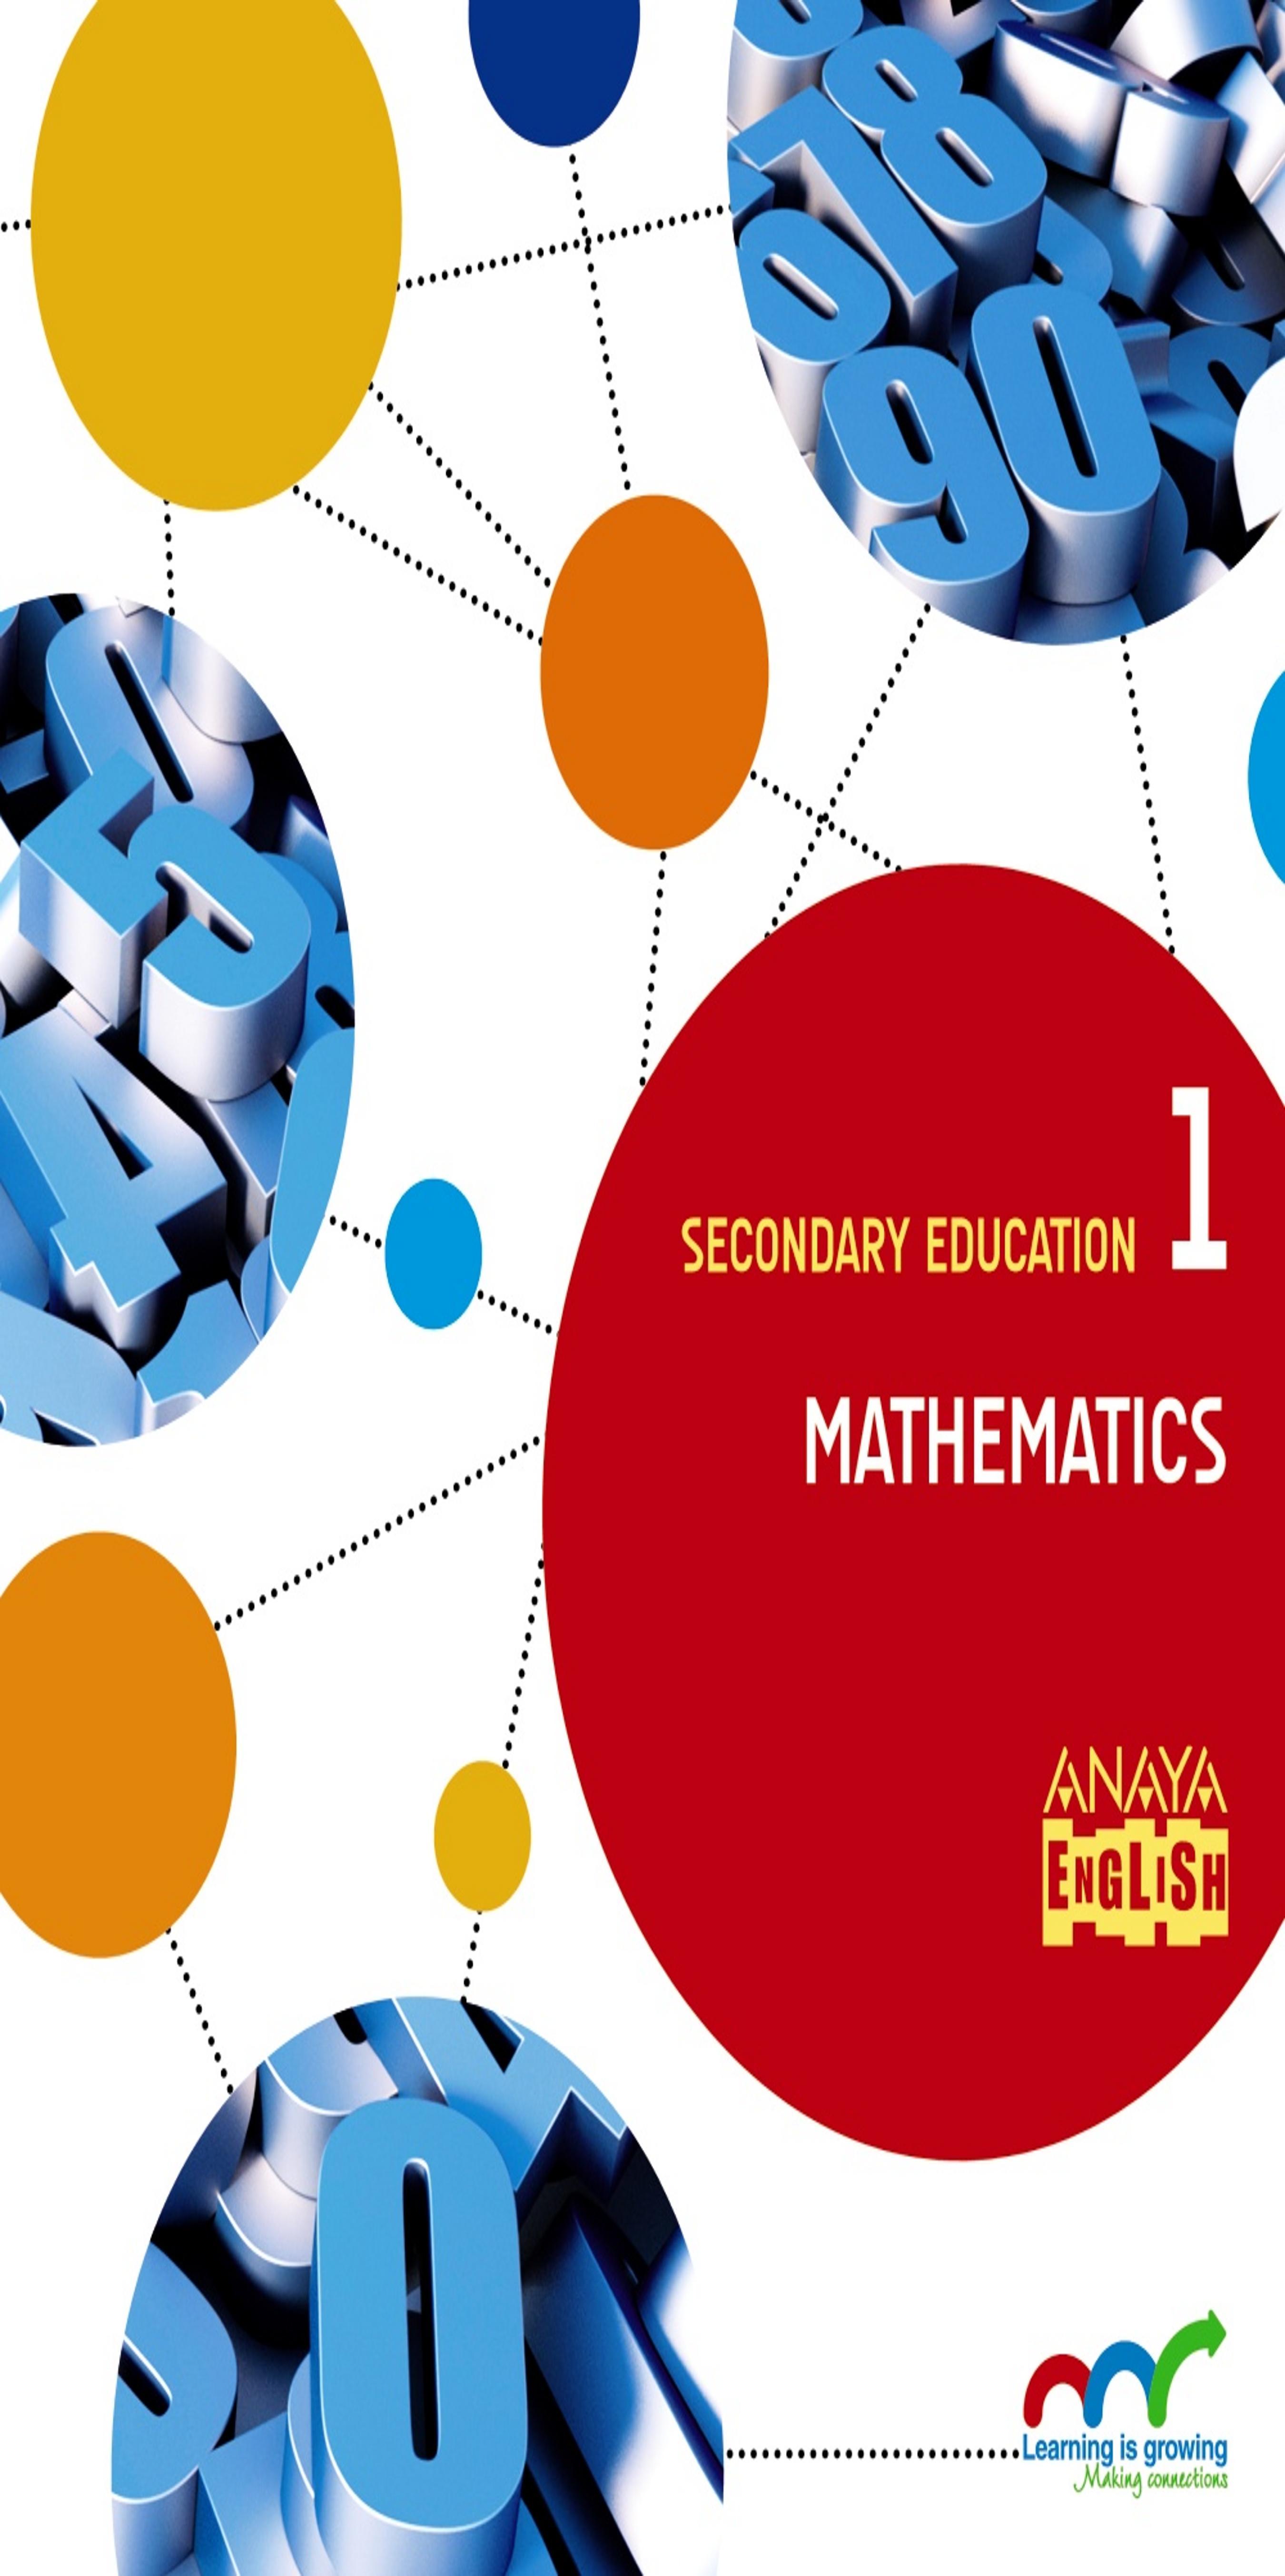 MATHEMATICS 1º ESO - Secondary Education